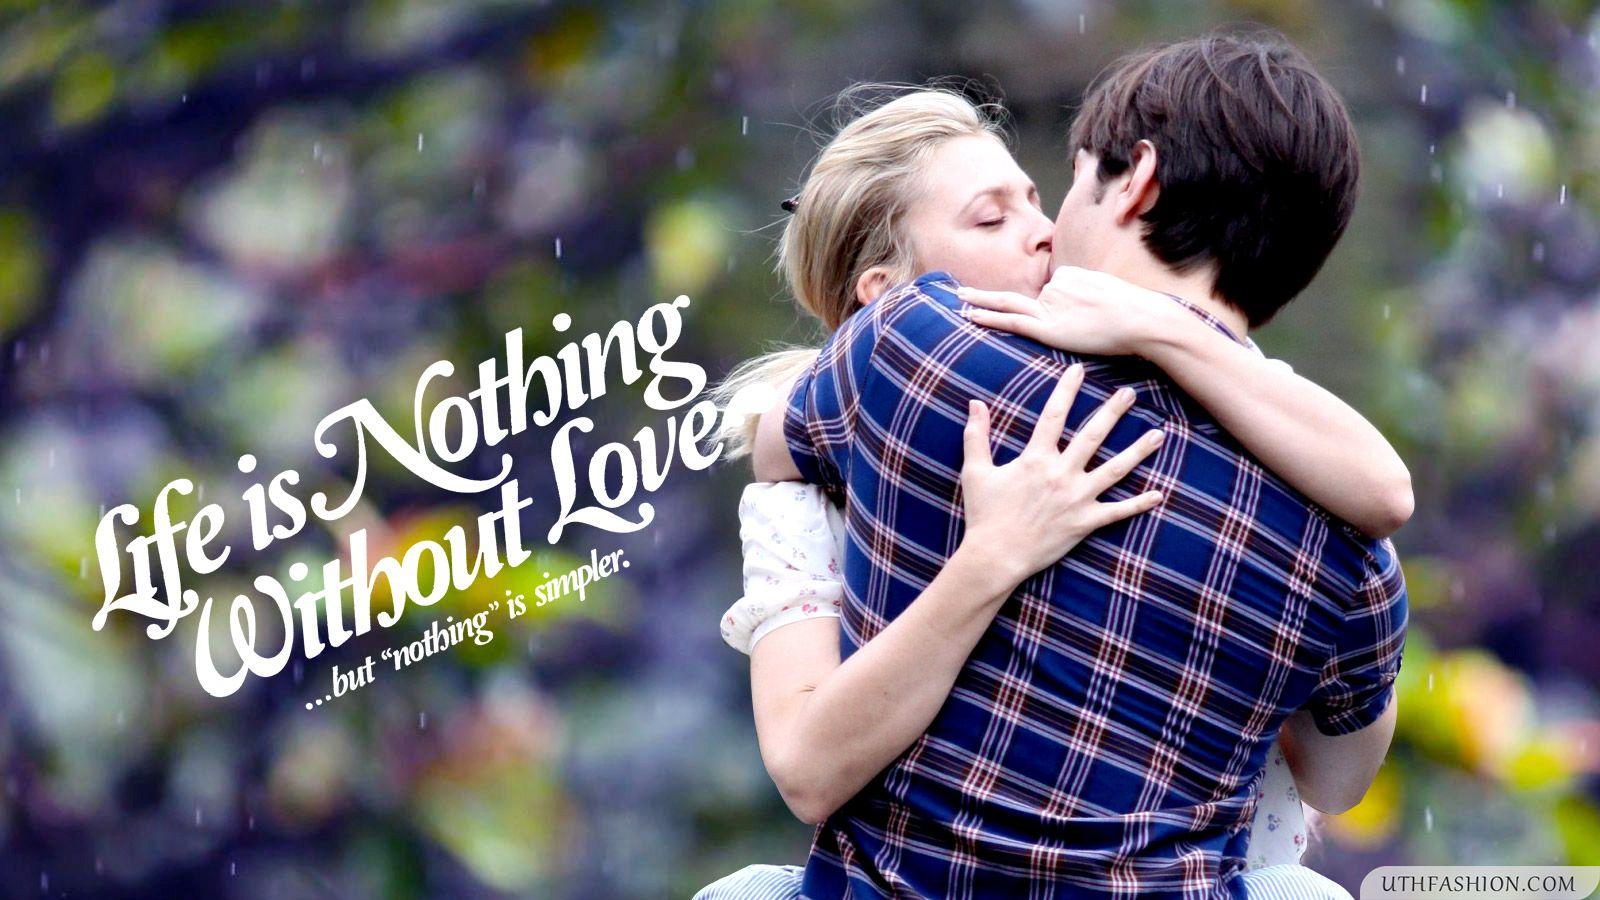 Wallpaper download hd love - Kissing Wallpaper 30 Kissing High Quality Pictures Lanlinglaurel Com Images Wallpapers Pinterest Wallpaper